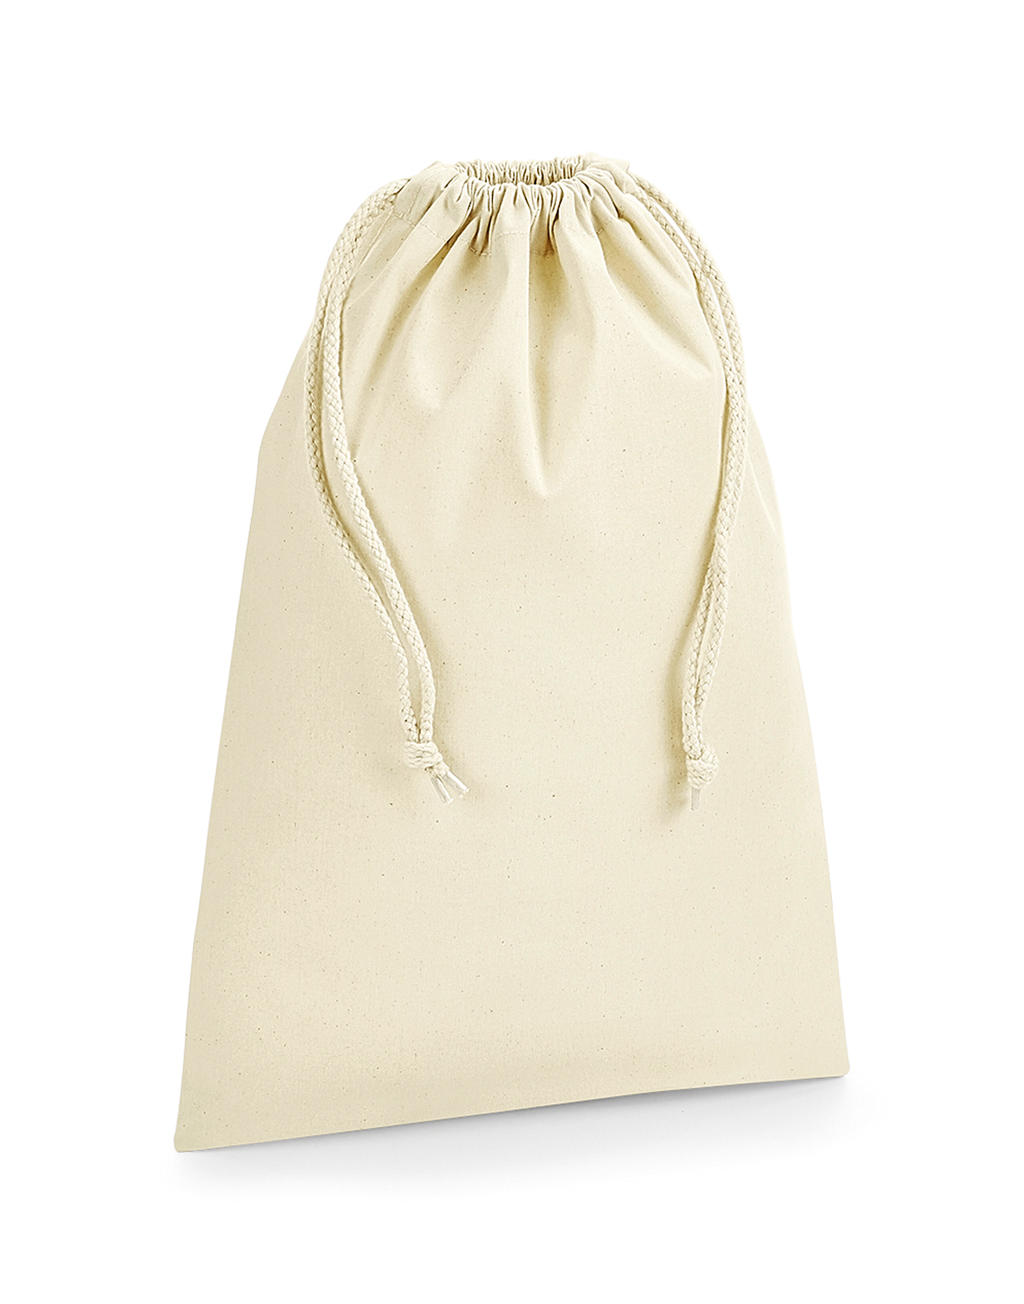 Premium organický pytlík z bavlny - zvìtšit obrázek